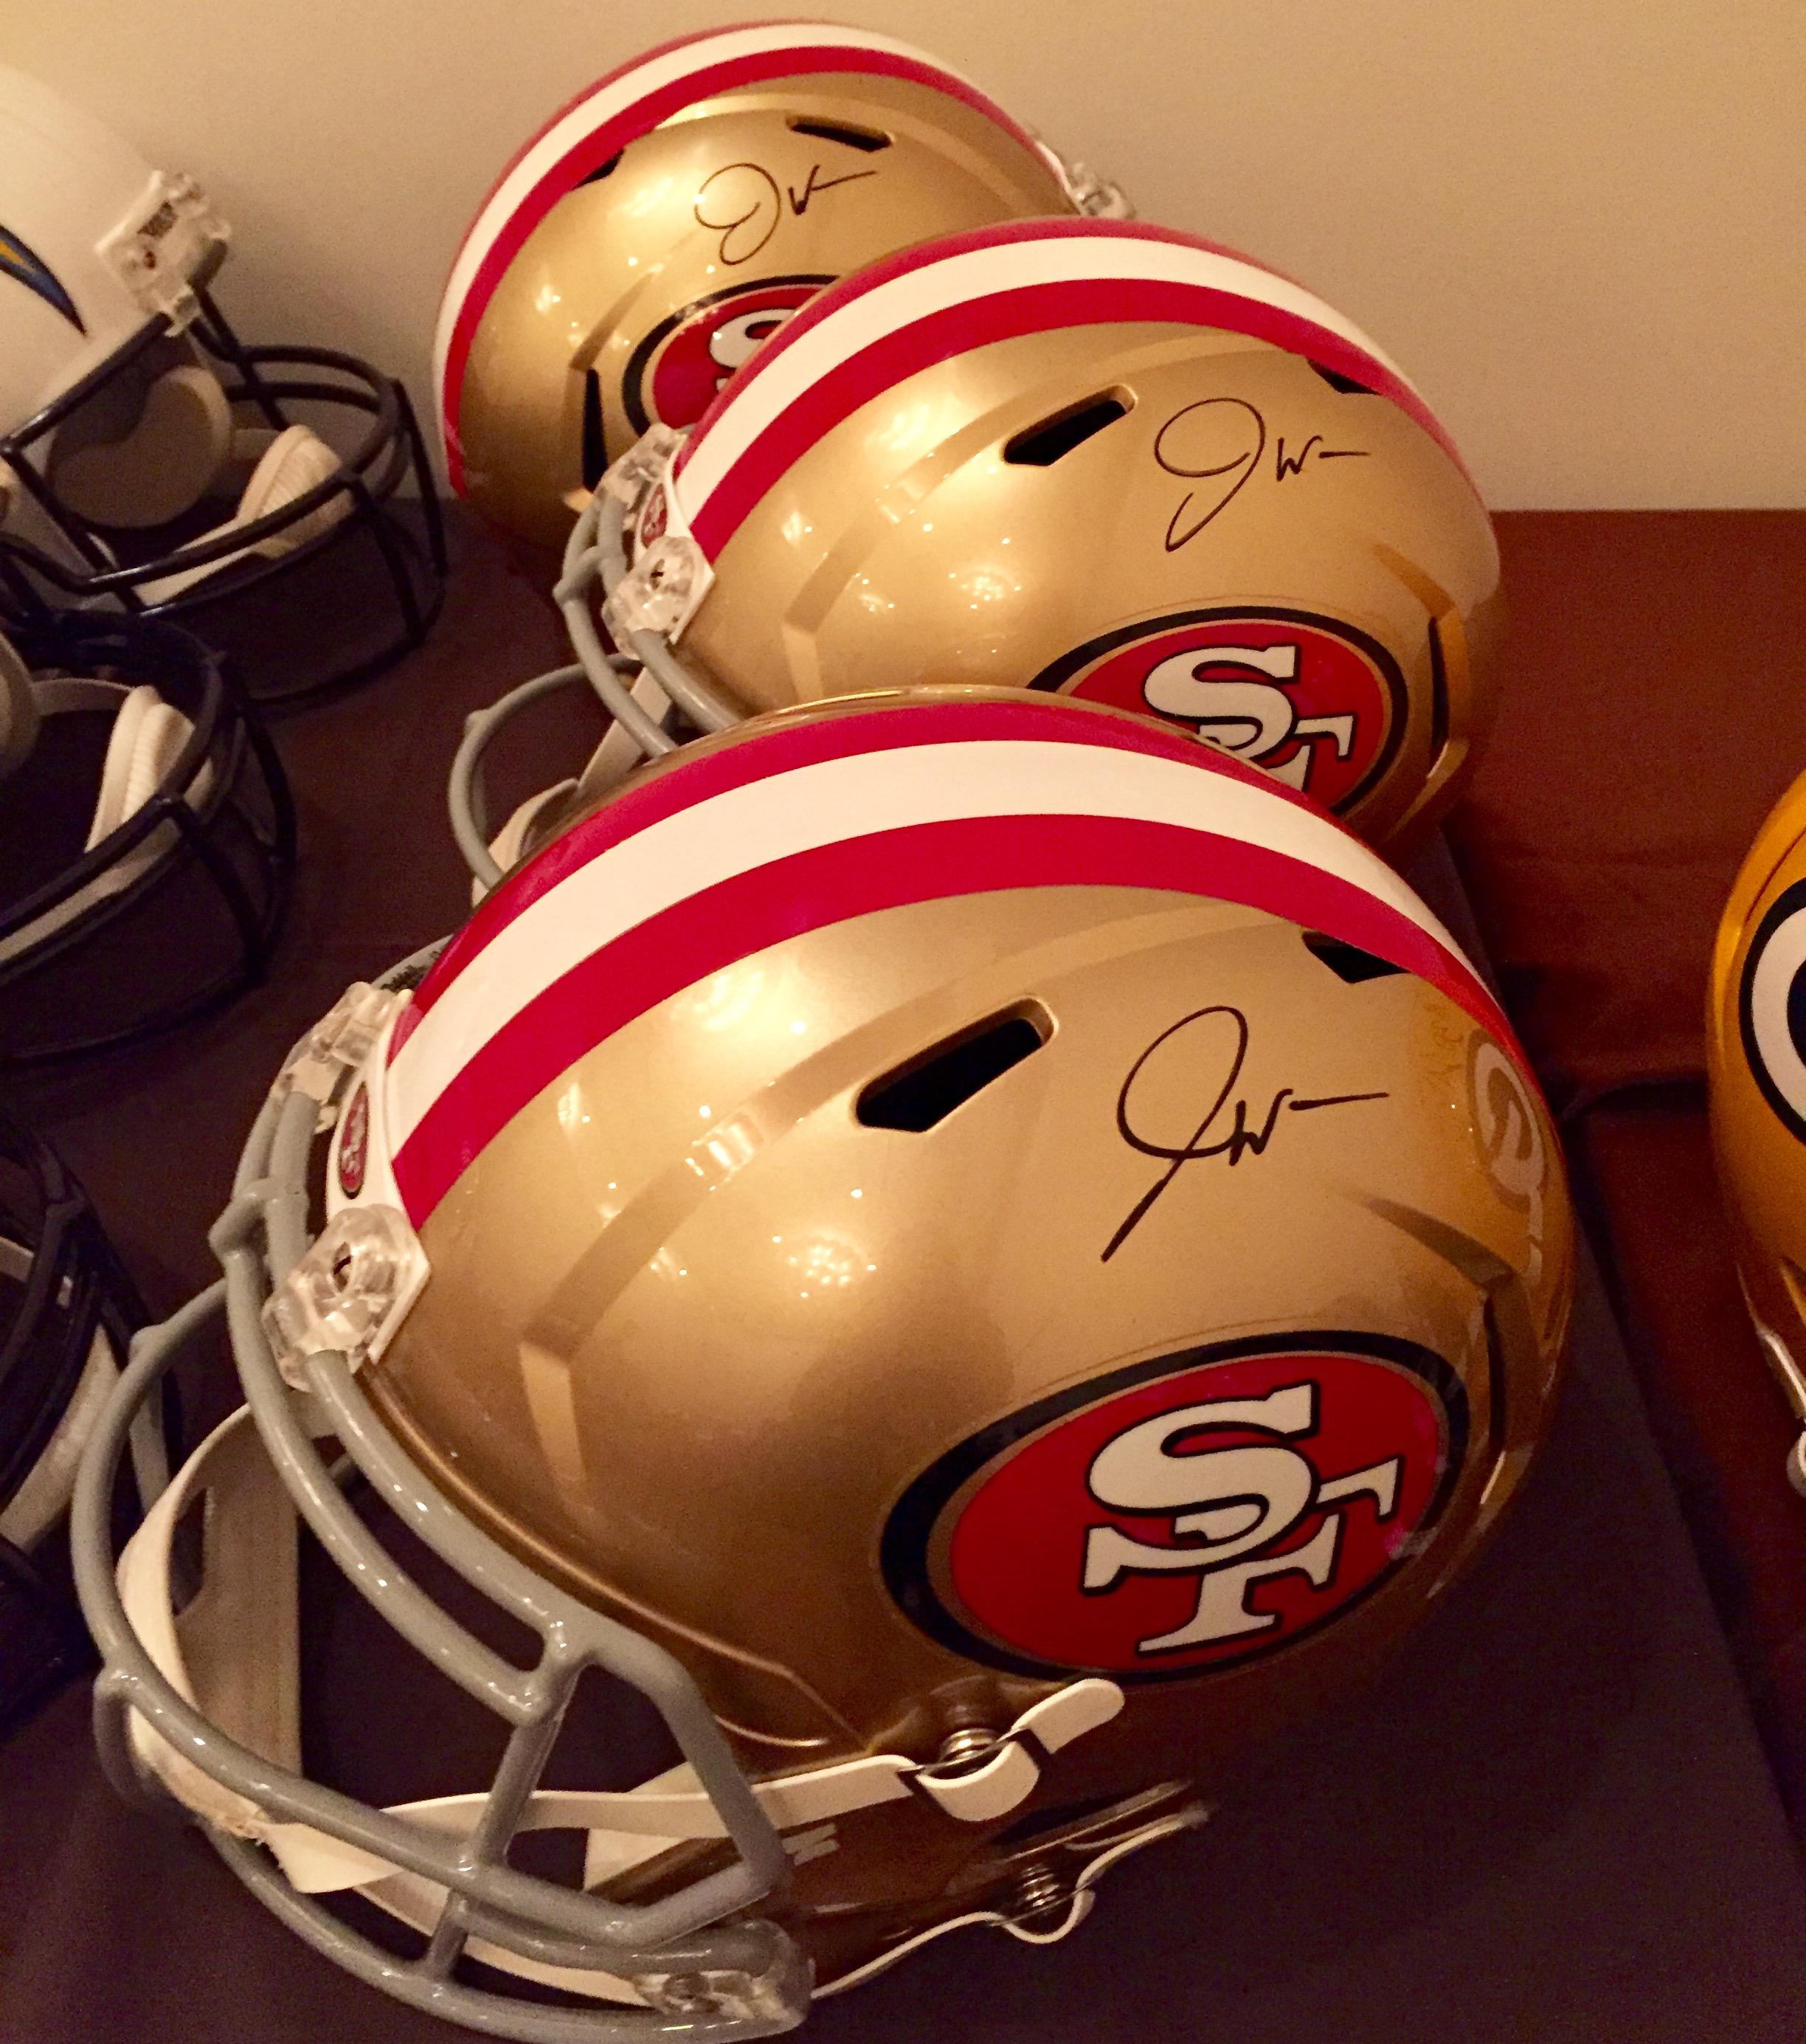 49ers C.J. Beathard And Joe Williams Were Honored To